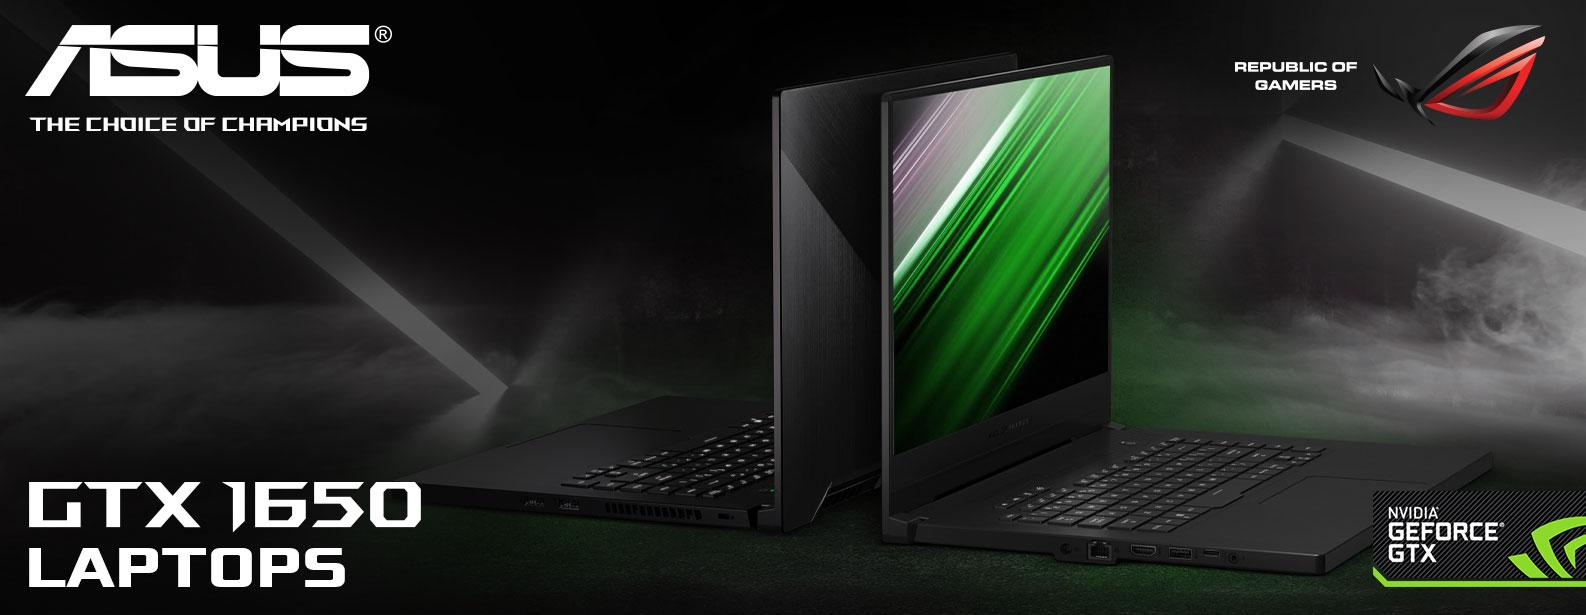 ASUS GTX 1650 Laptop Deals South Africa